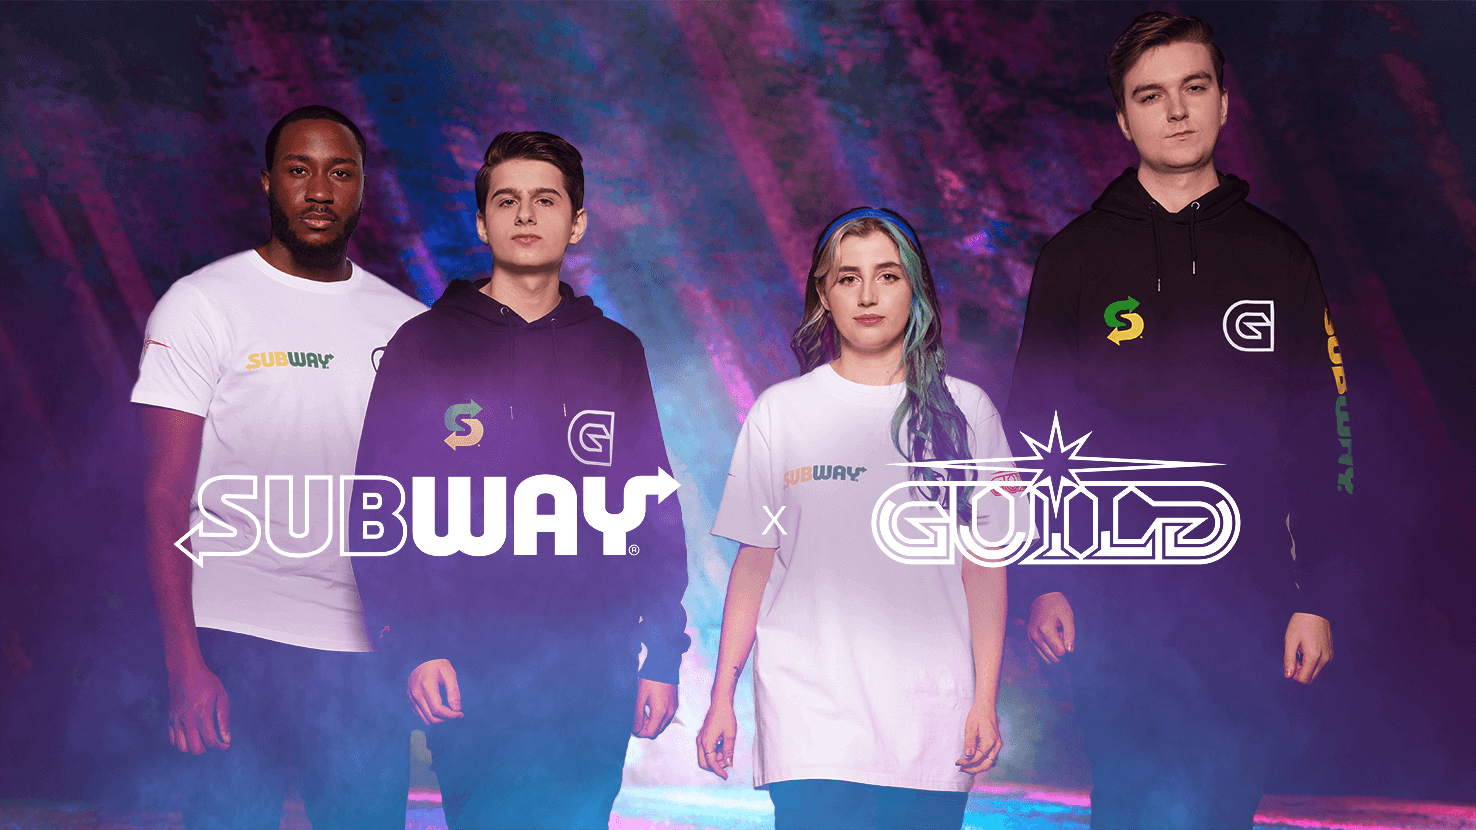 Subway® & Guild